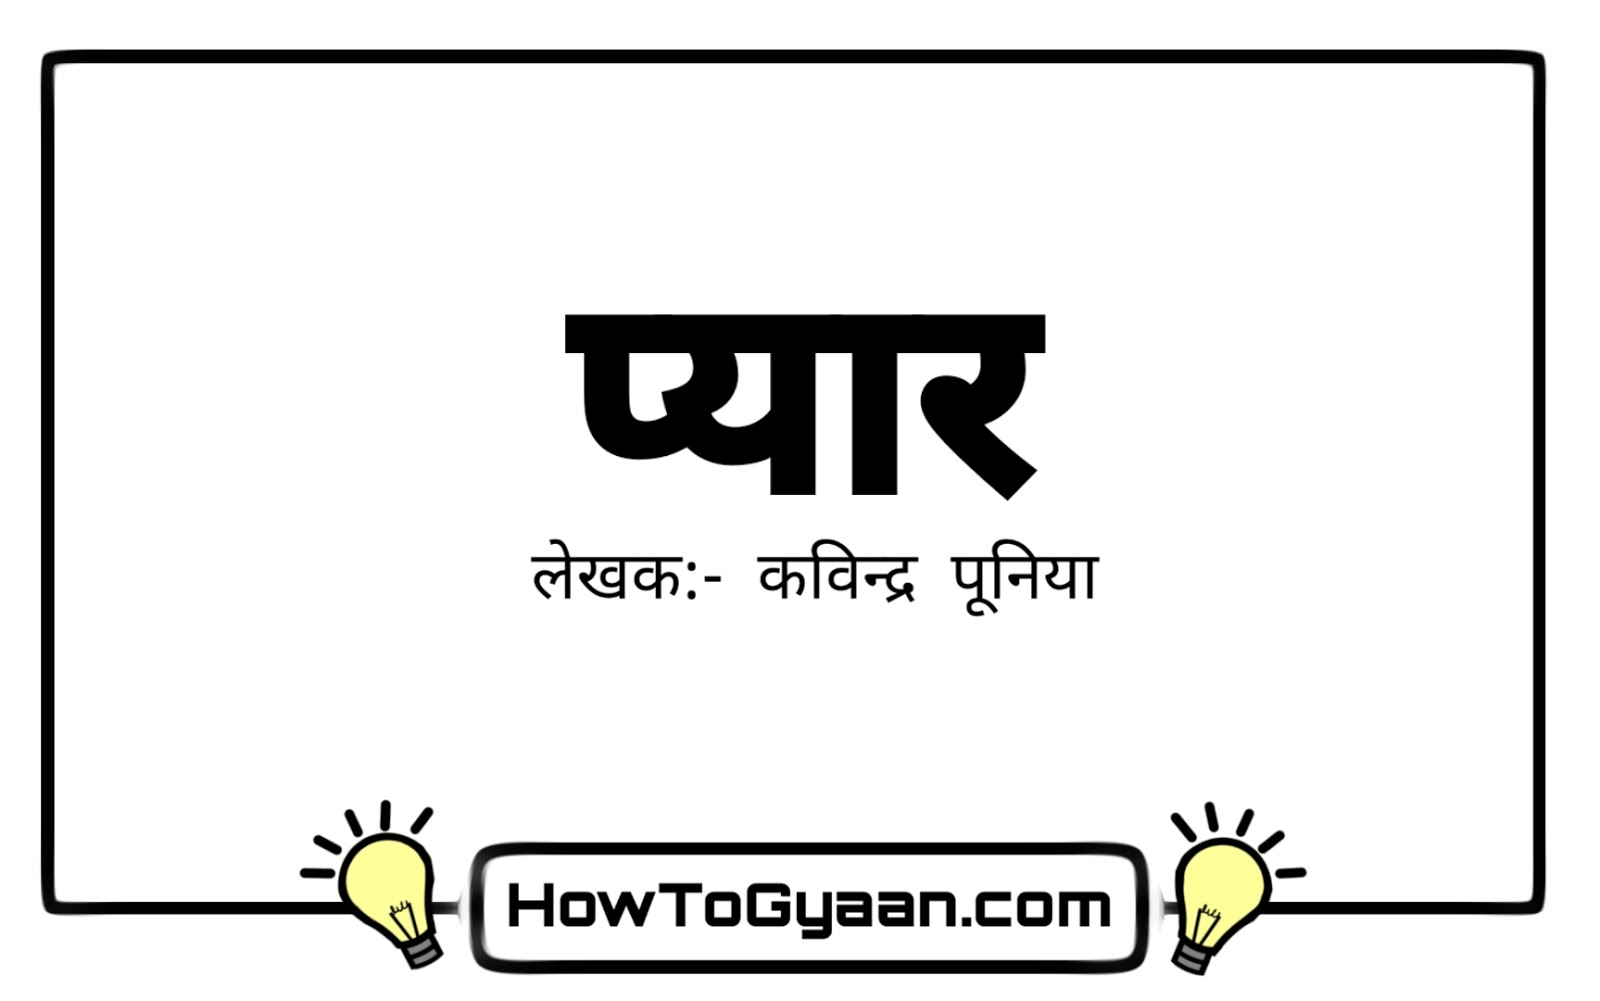 hindi prem kavita, pyaar ki kavita , poem in hindi for love, love poem in hindi for girlfriend, romantic poem in hindi, romantic love poems in hindi.